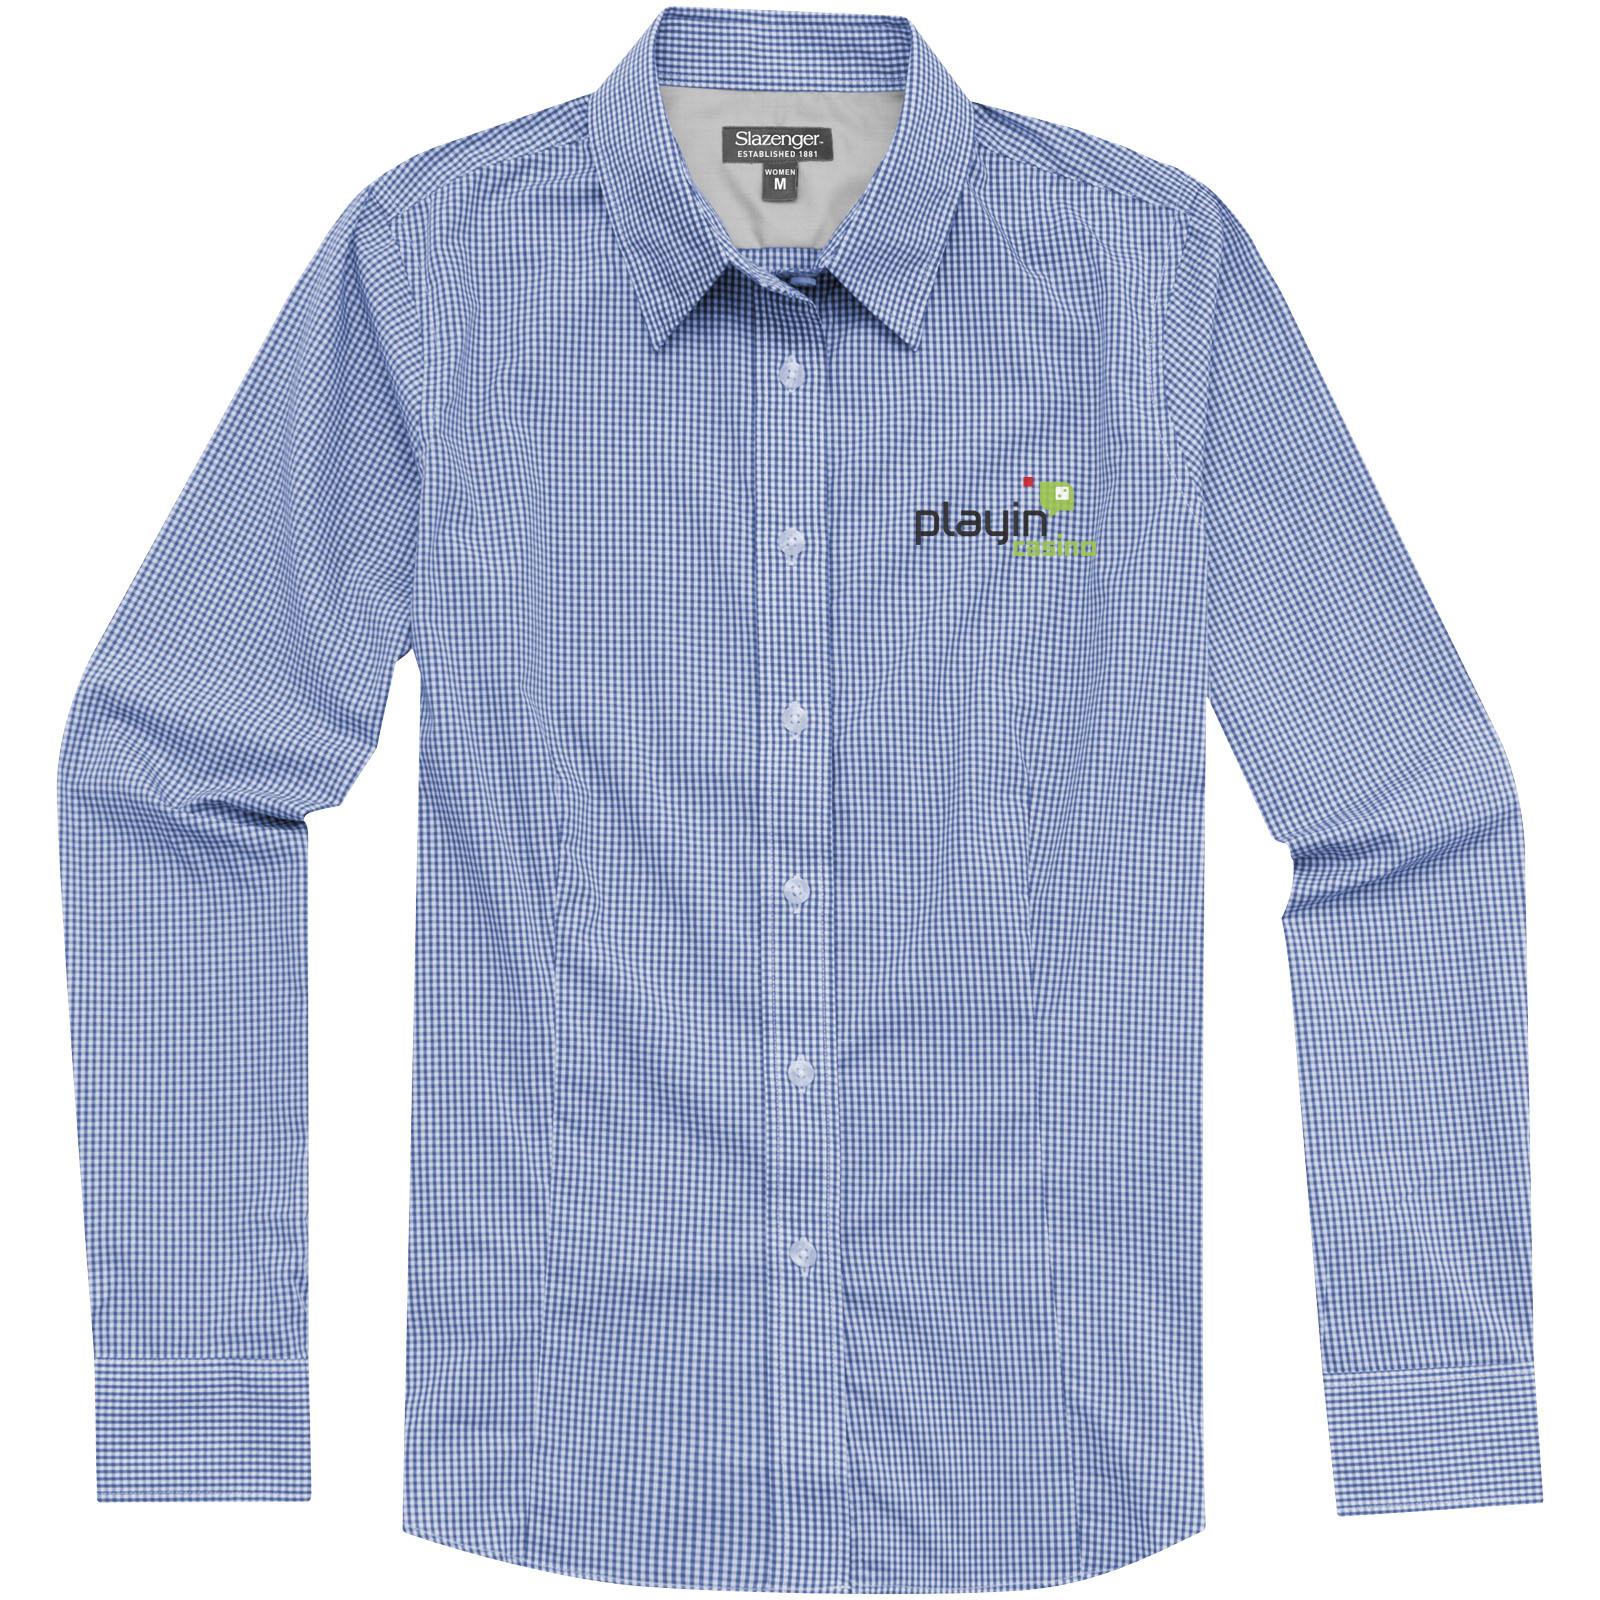 593f0f11ab37c5 Nette dames blouse met lange mouwen bedrukken? - Voordelig & snel ...